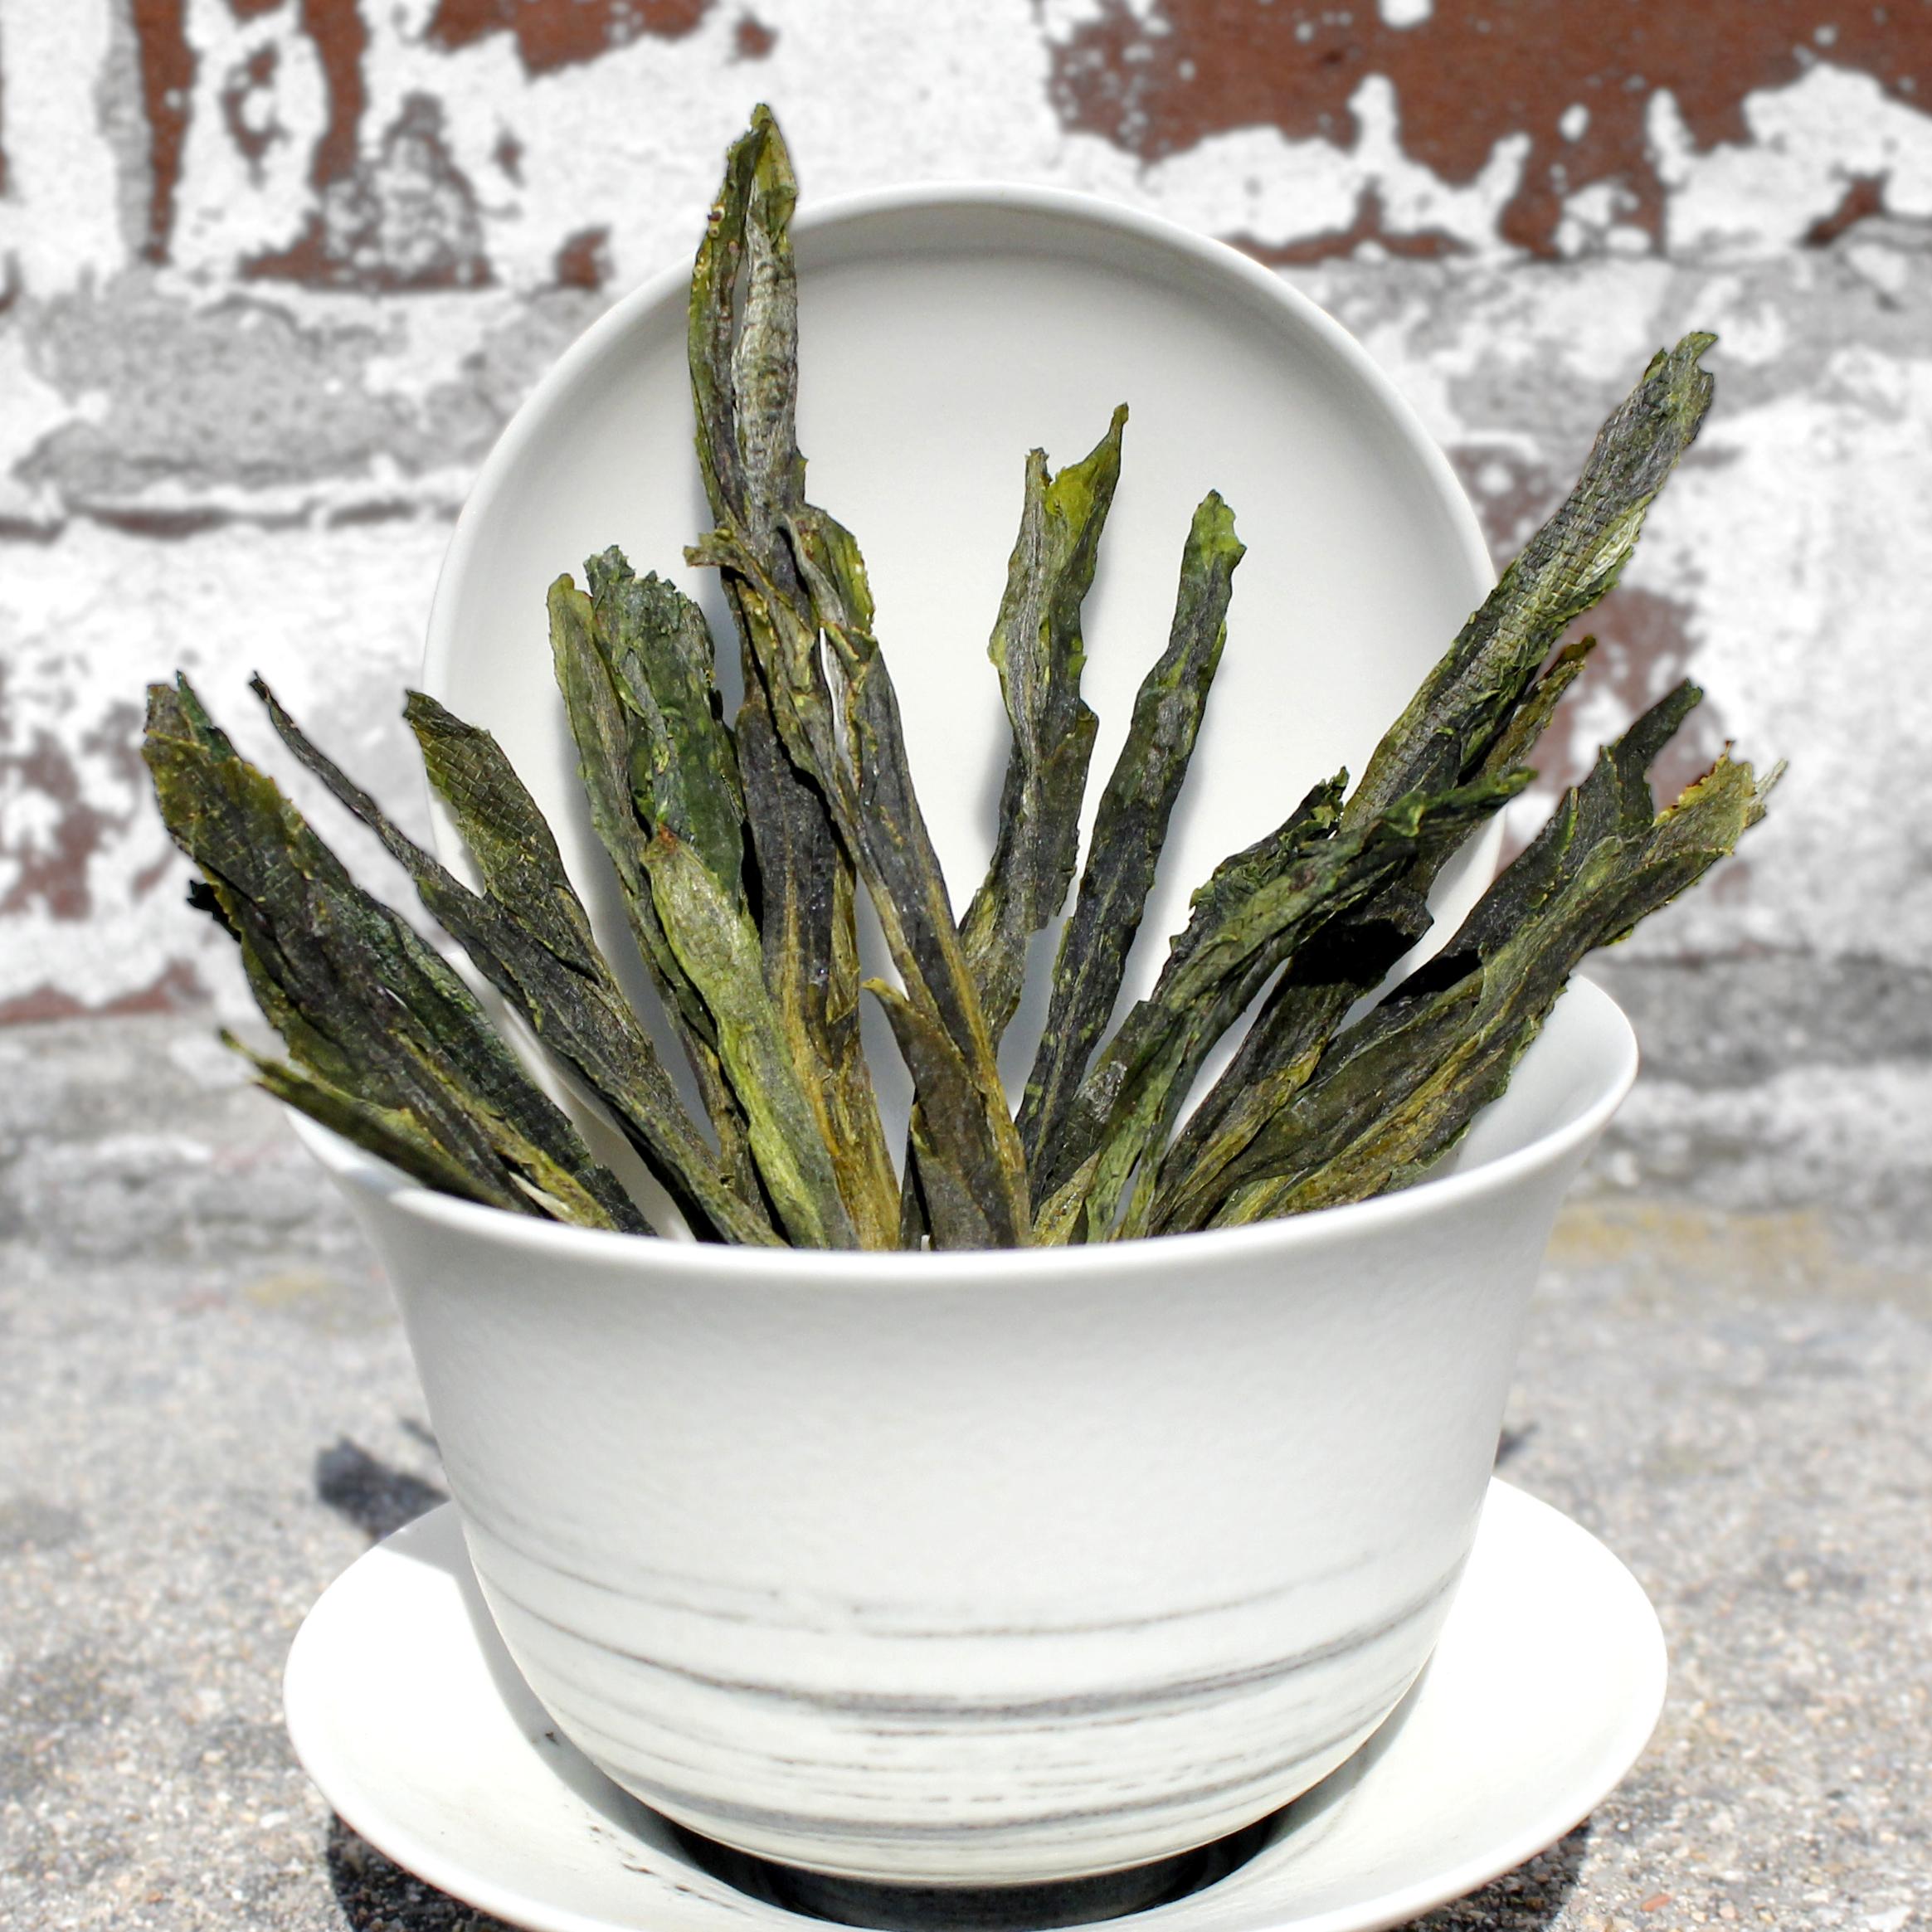 tai-ping-hou-kui-green-whole-leaf-loose-tea-itw1.jpg